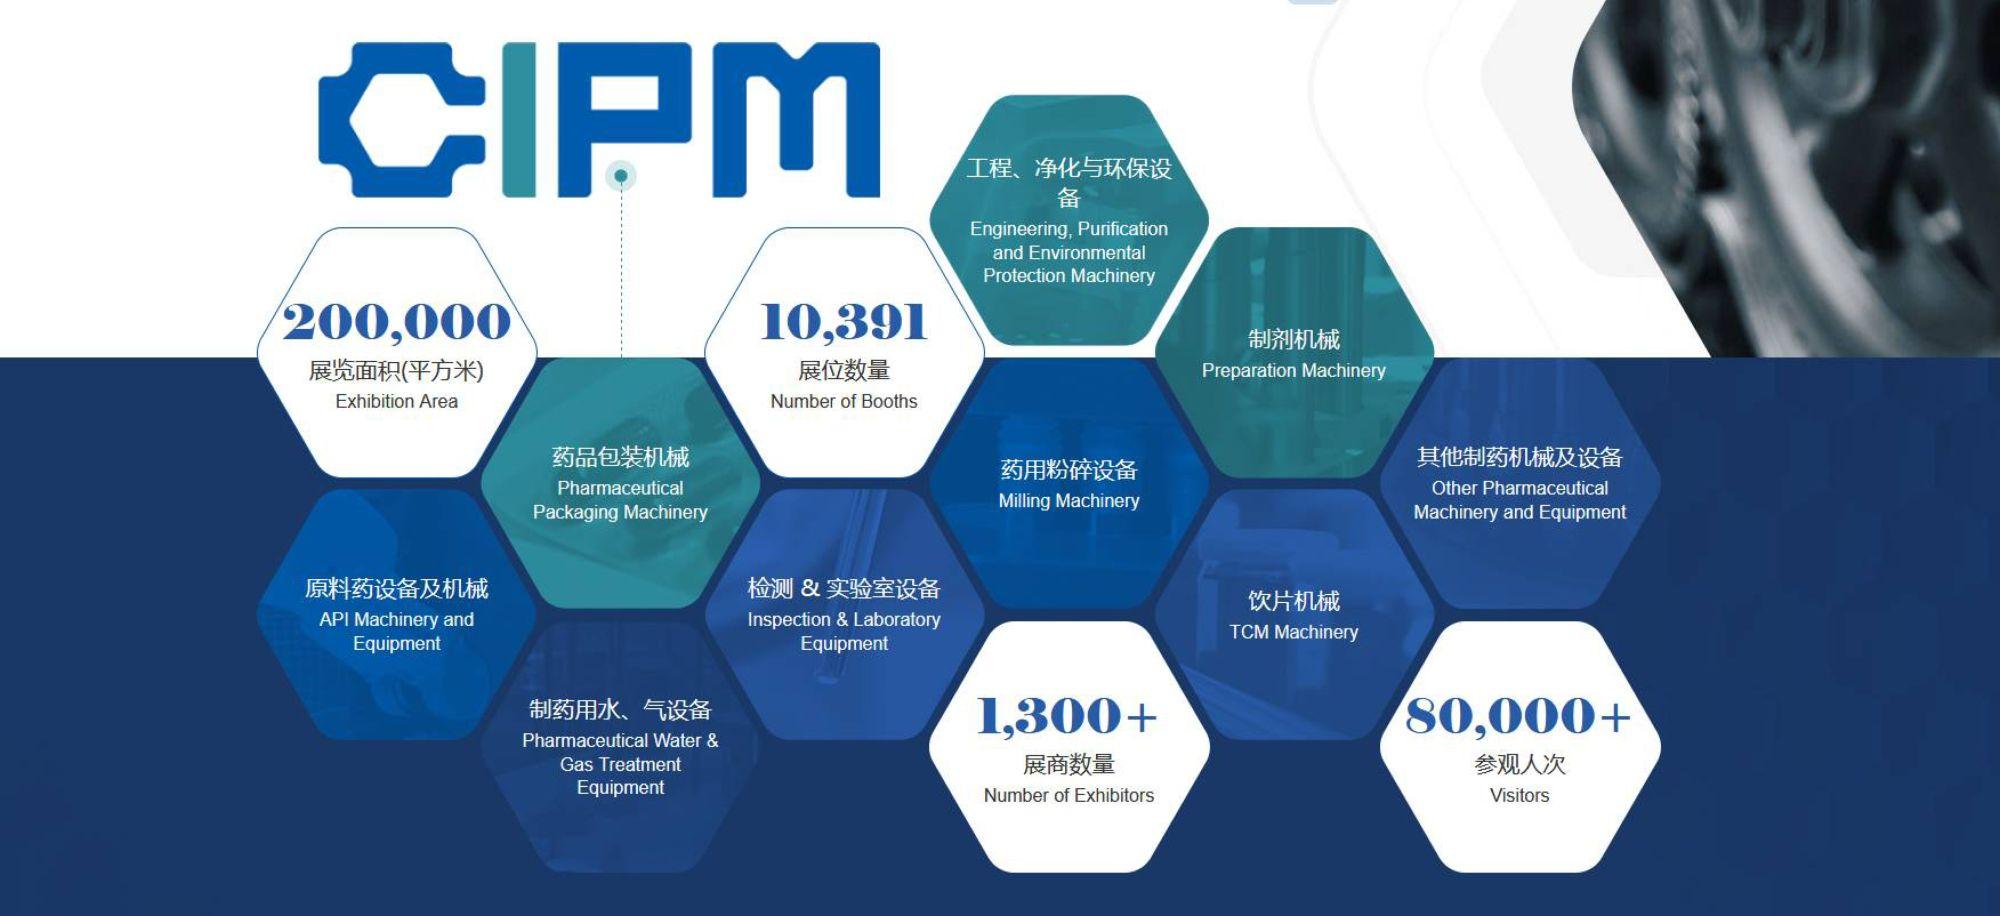 CN_202010030_pharma_localcontent_CIPM-2020-im02.jpg